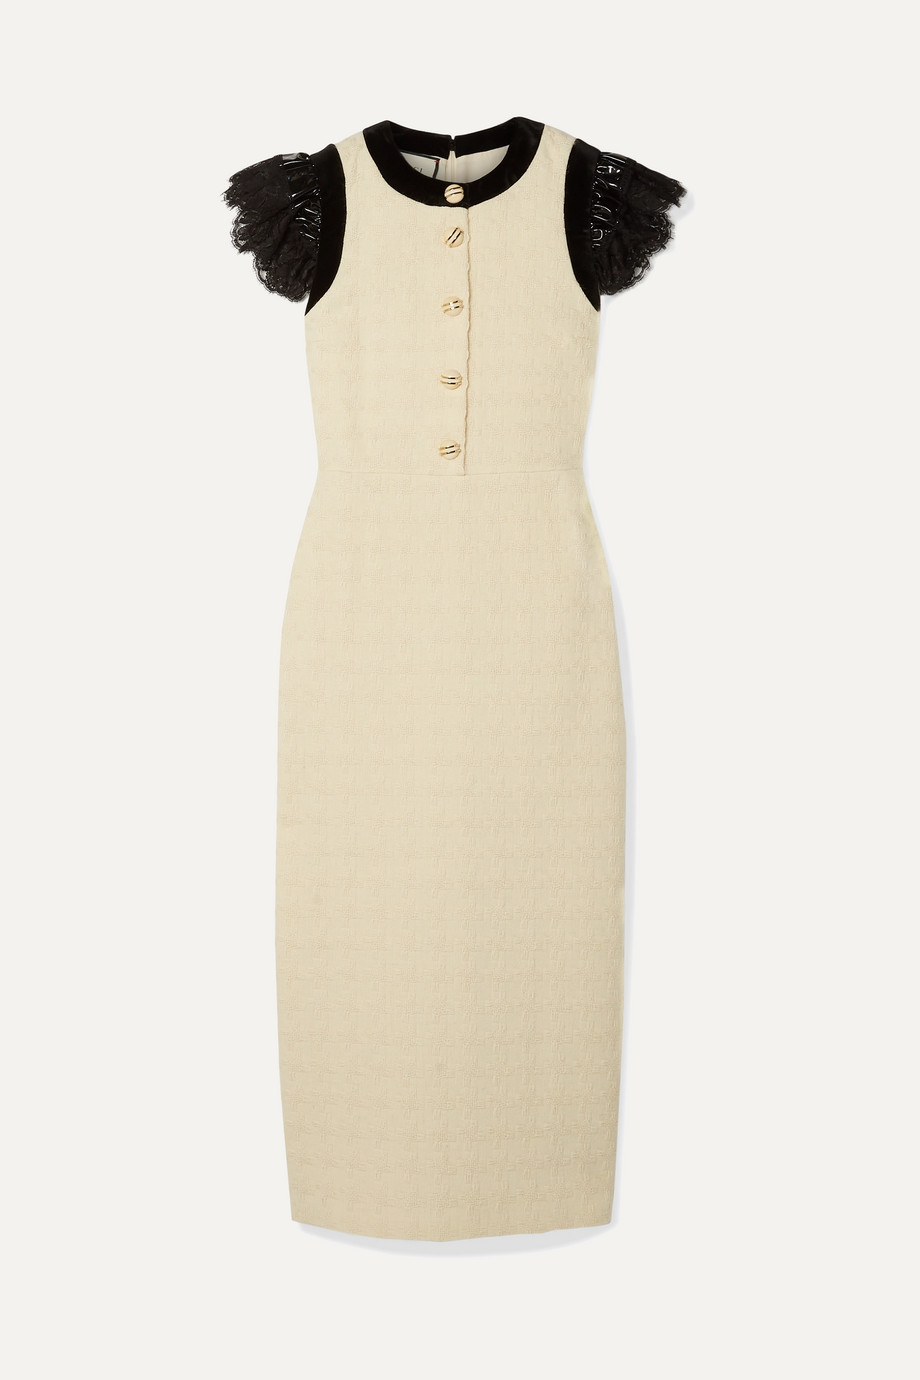 Gucci Velvet, vinyl and lace-trimmed wool-blend jacquard midi dress